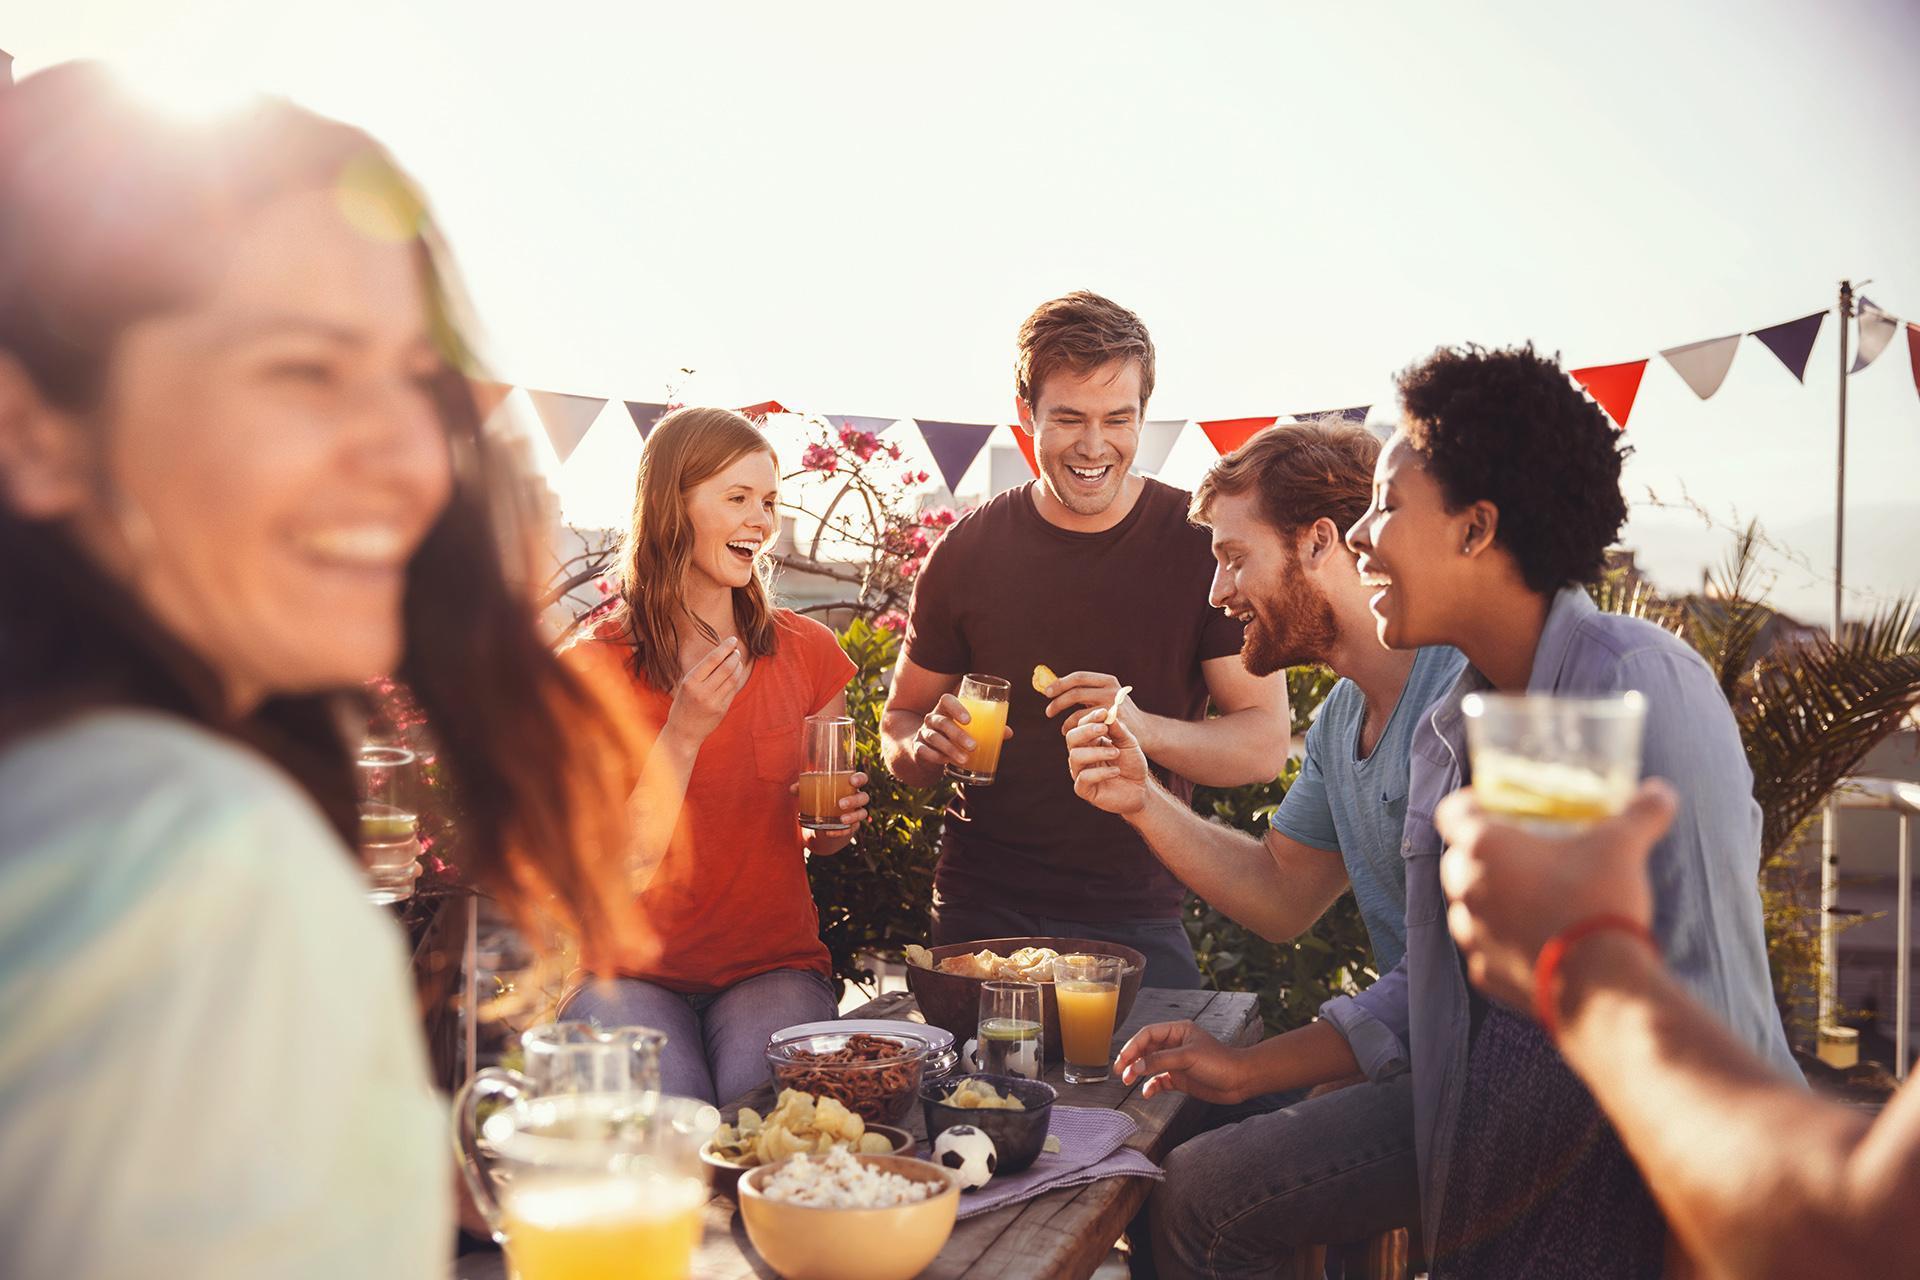 party-freunde-feiern-drinks-sonne